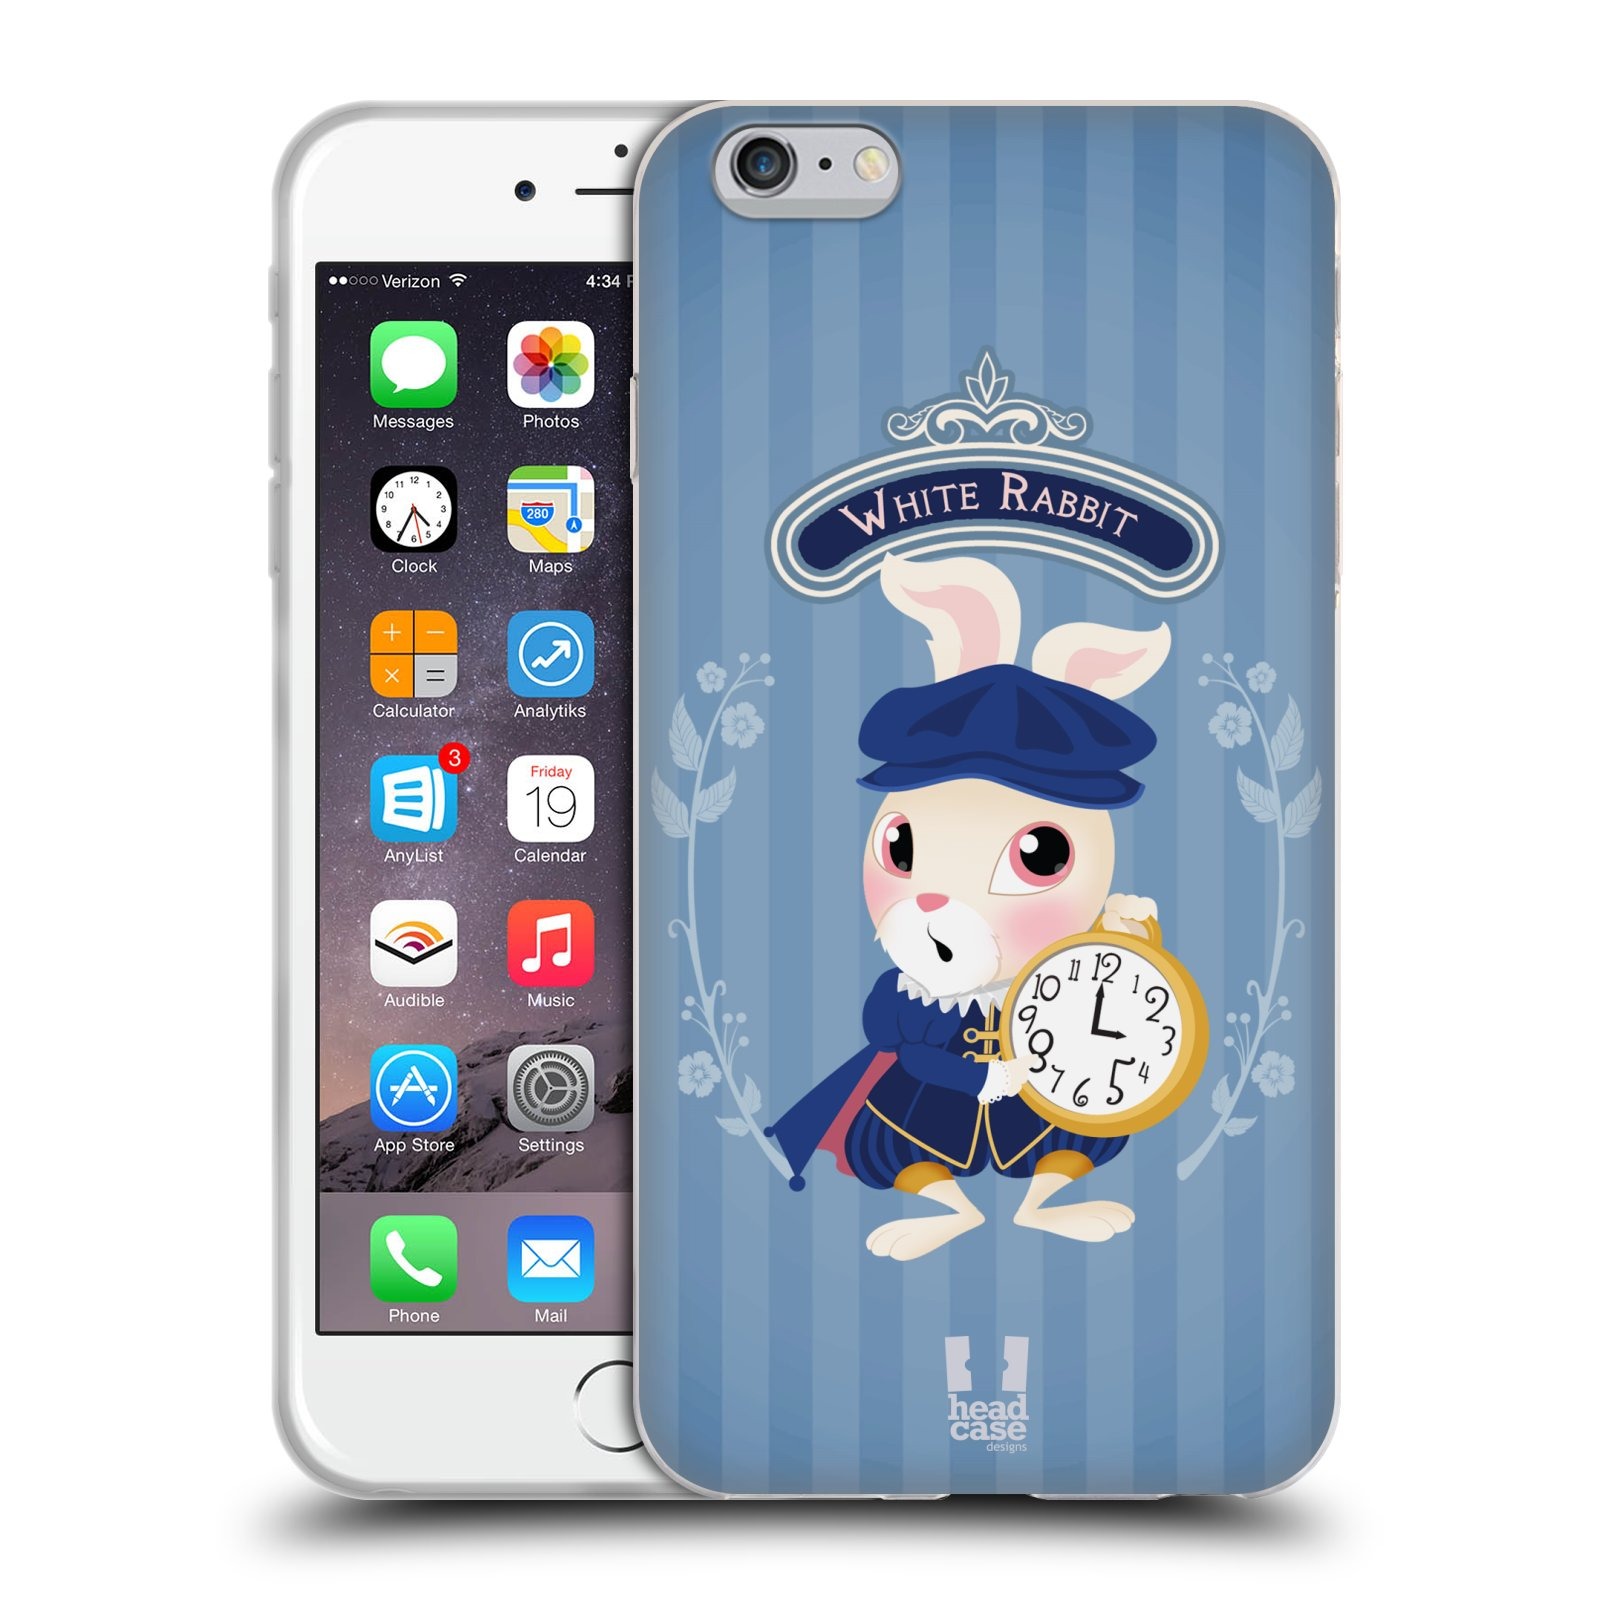 HEAD CASE silikonový obal na mobil Apple Iphone 6 PLUS/ 6S PLUS vzor Alenka v říši divů králíček